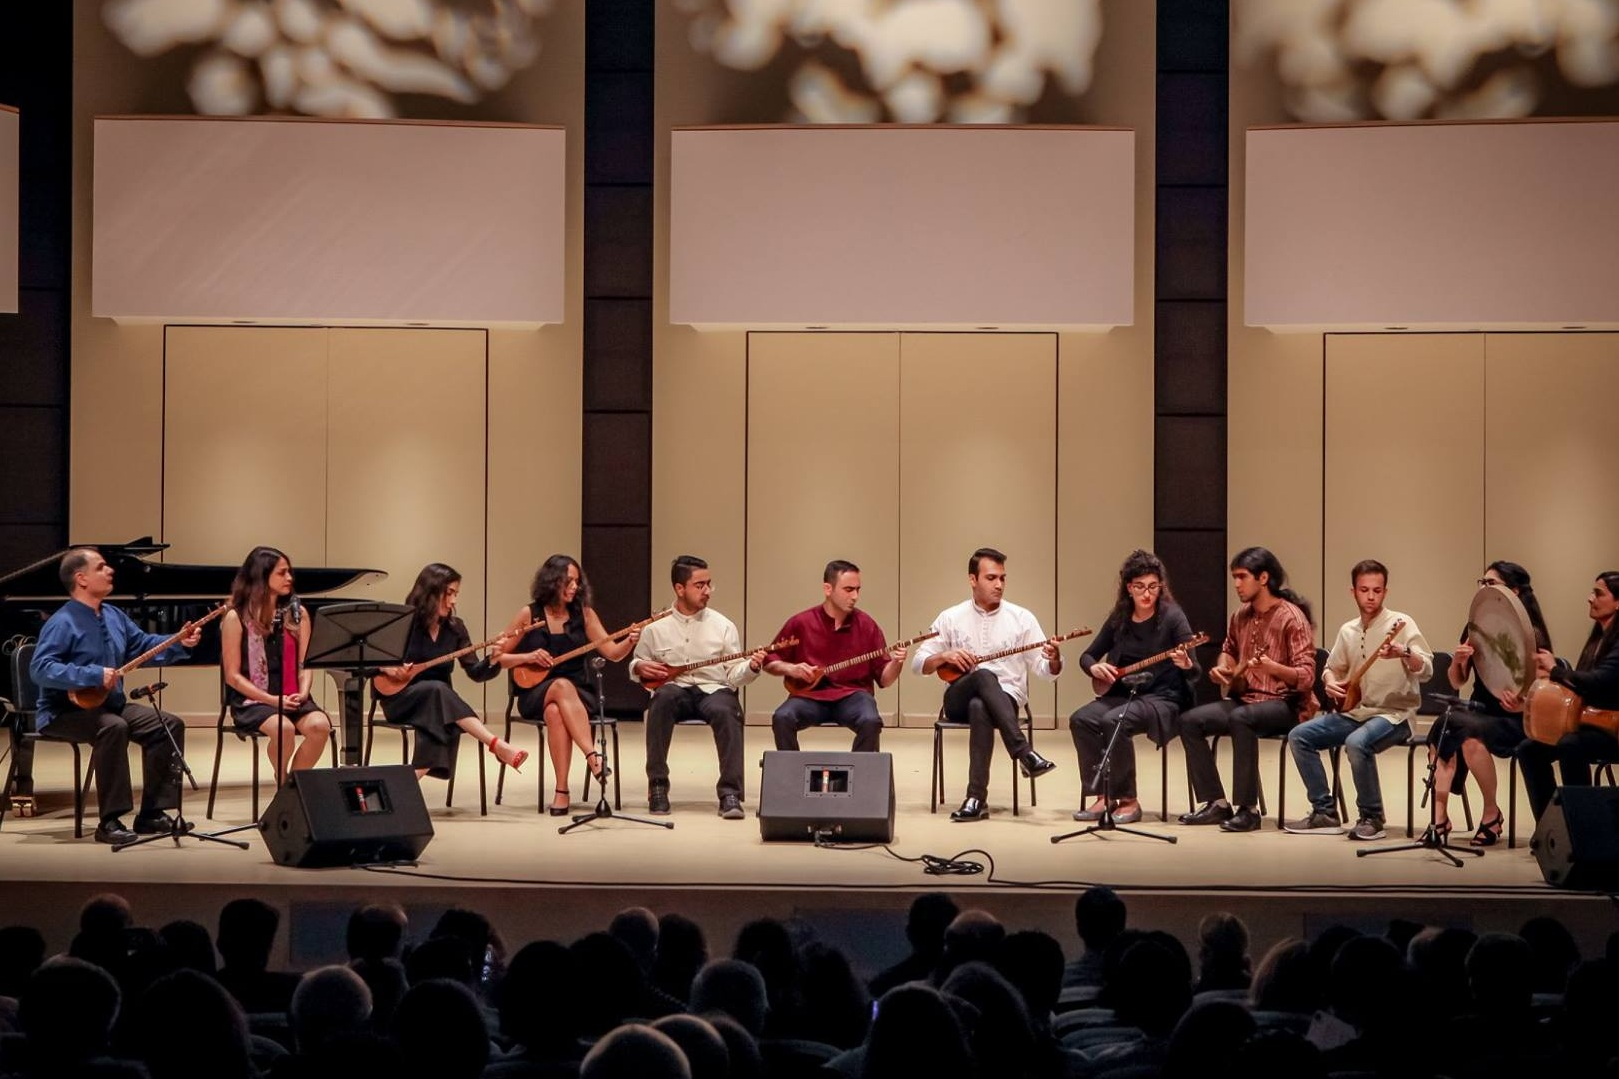 Setar Ensemble (directed by Shahin Fayaz)